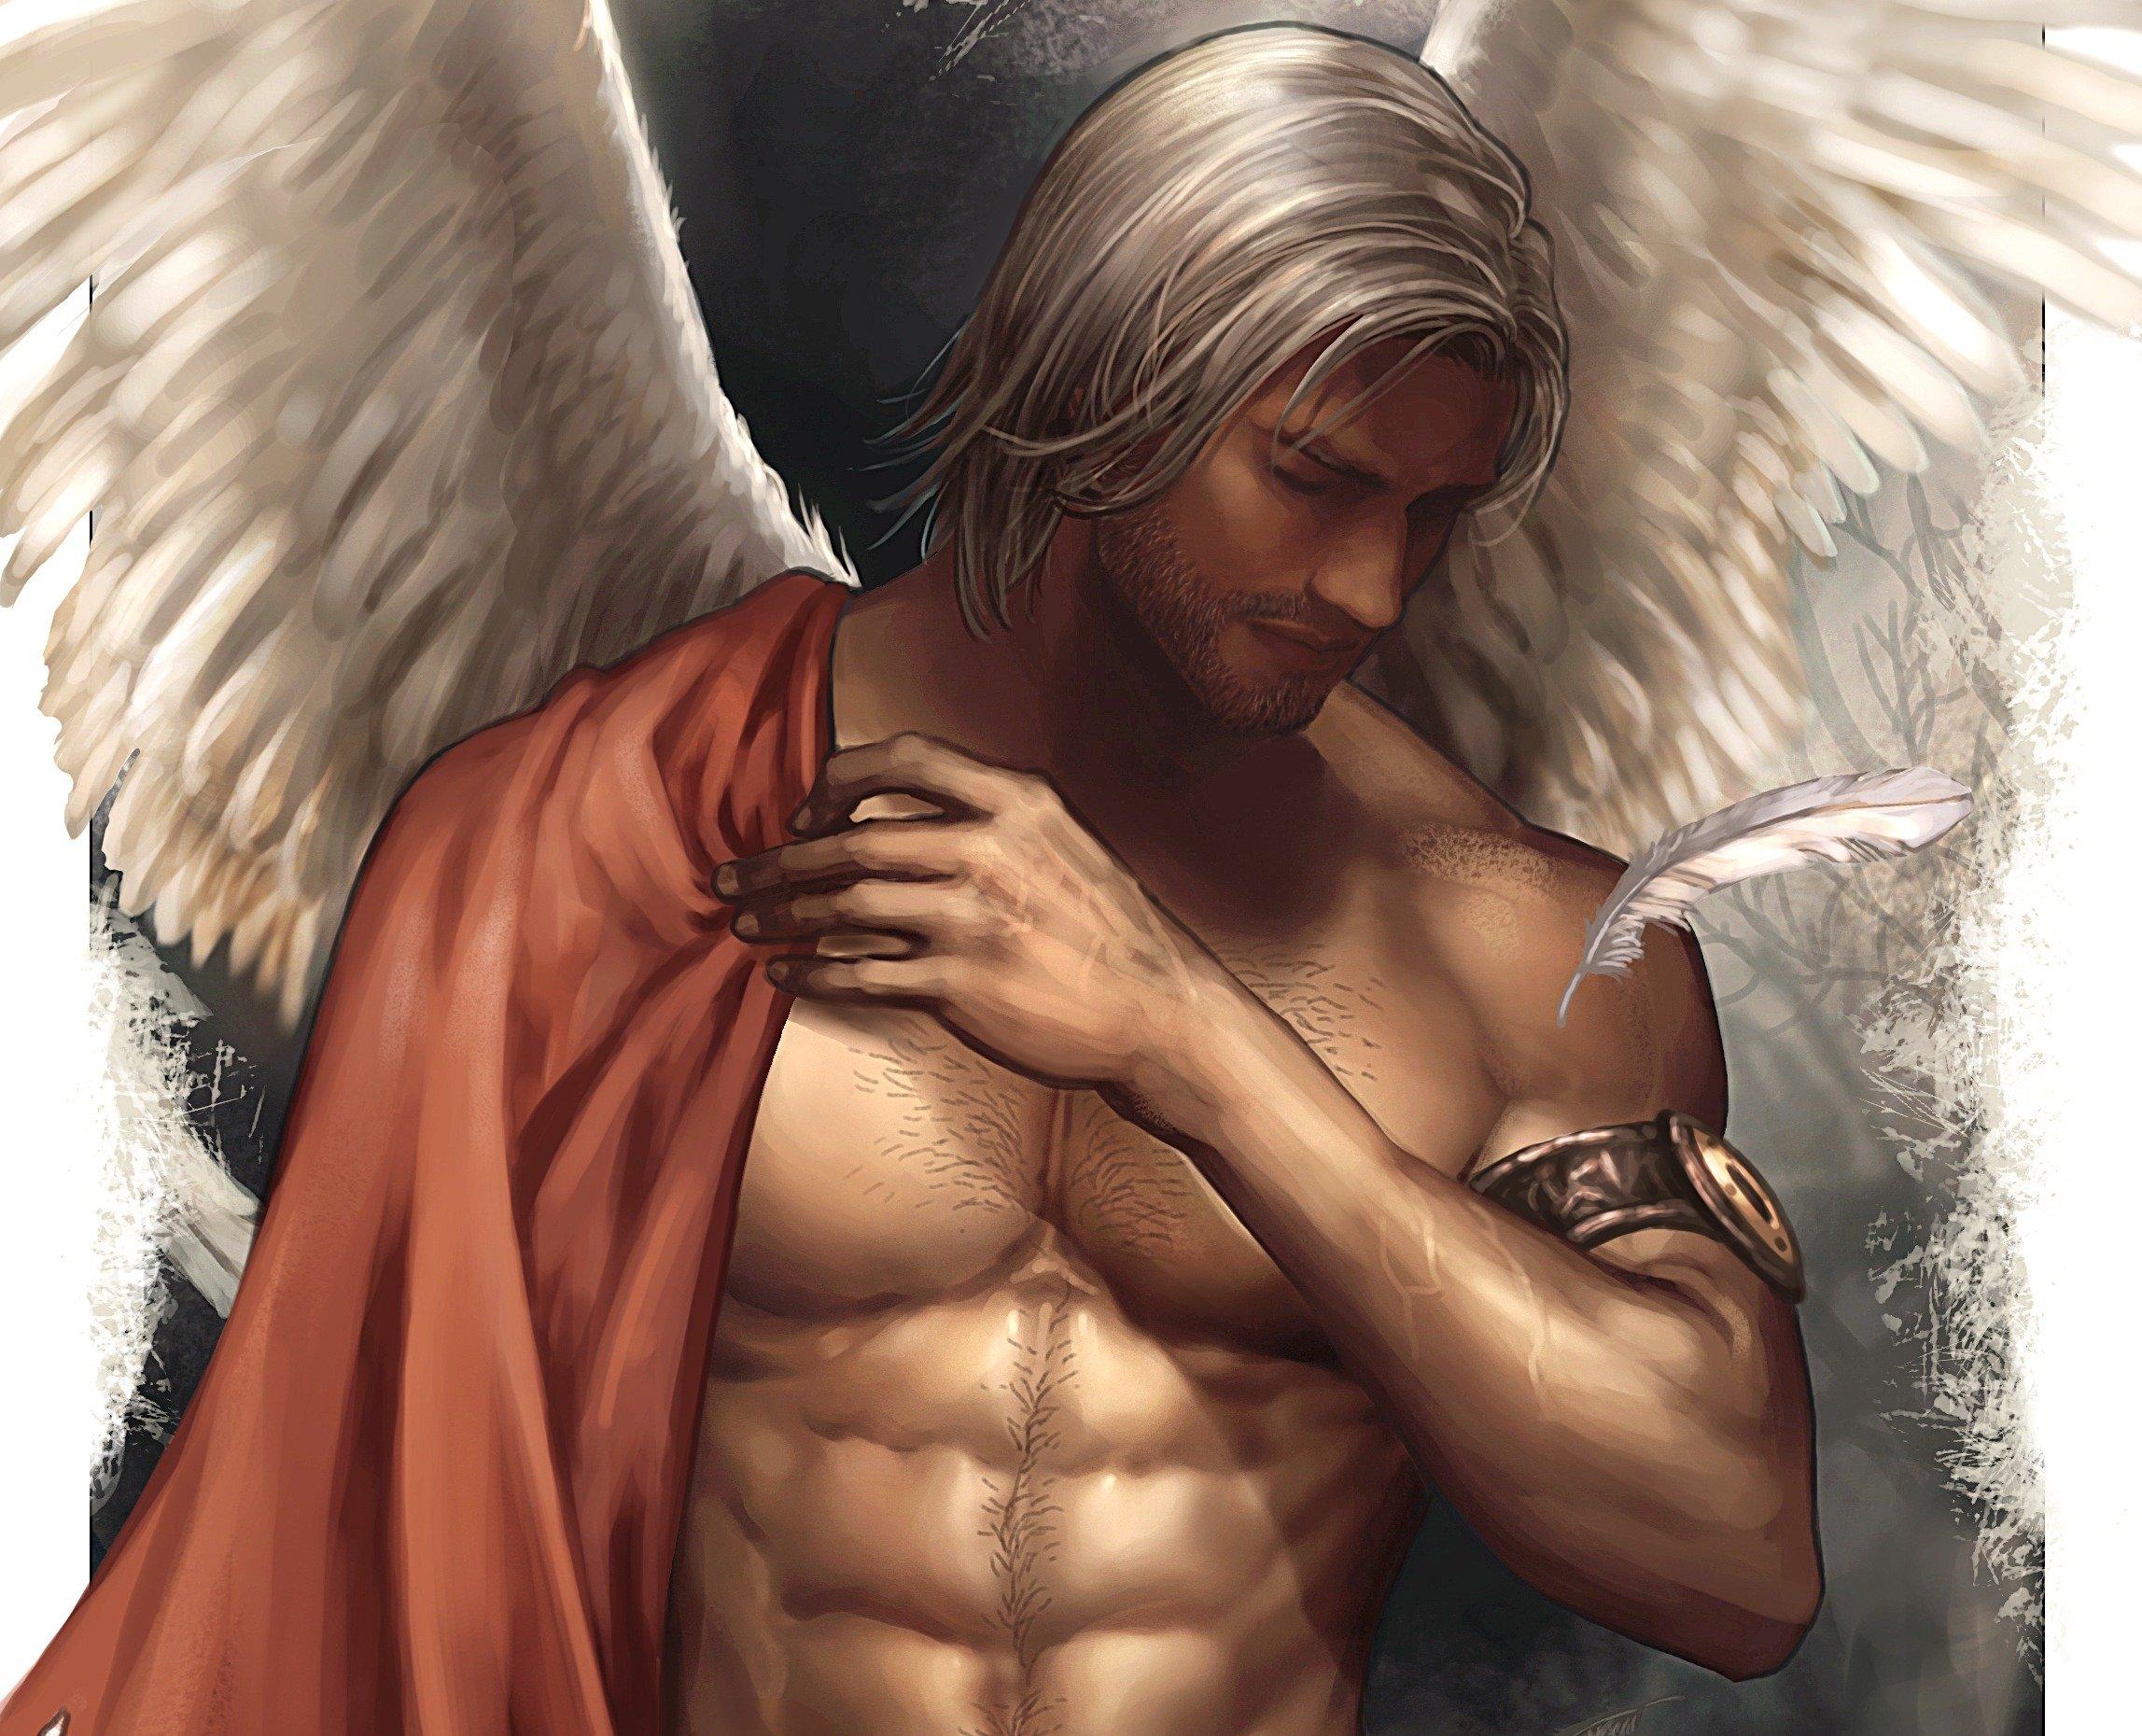 Fantasy Male Angel Wings Character Beautiful Wallpaper Beautiful Fantasy Male Angel 2295x1860 Download Hd Wallpaper Wallpapertip